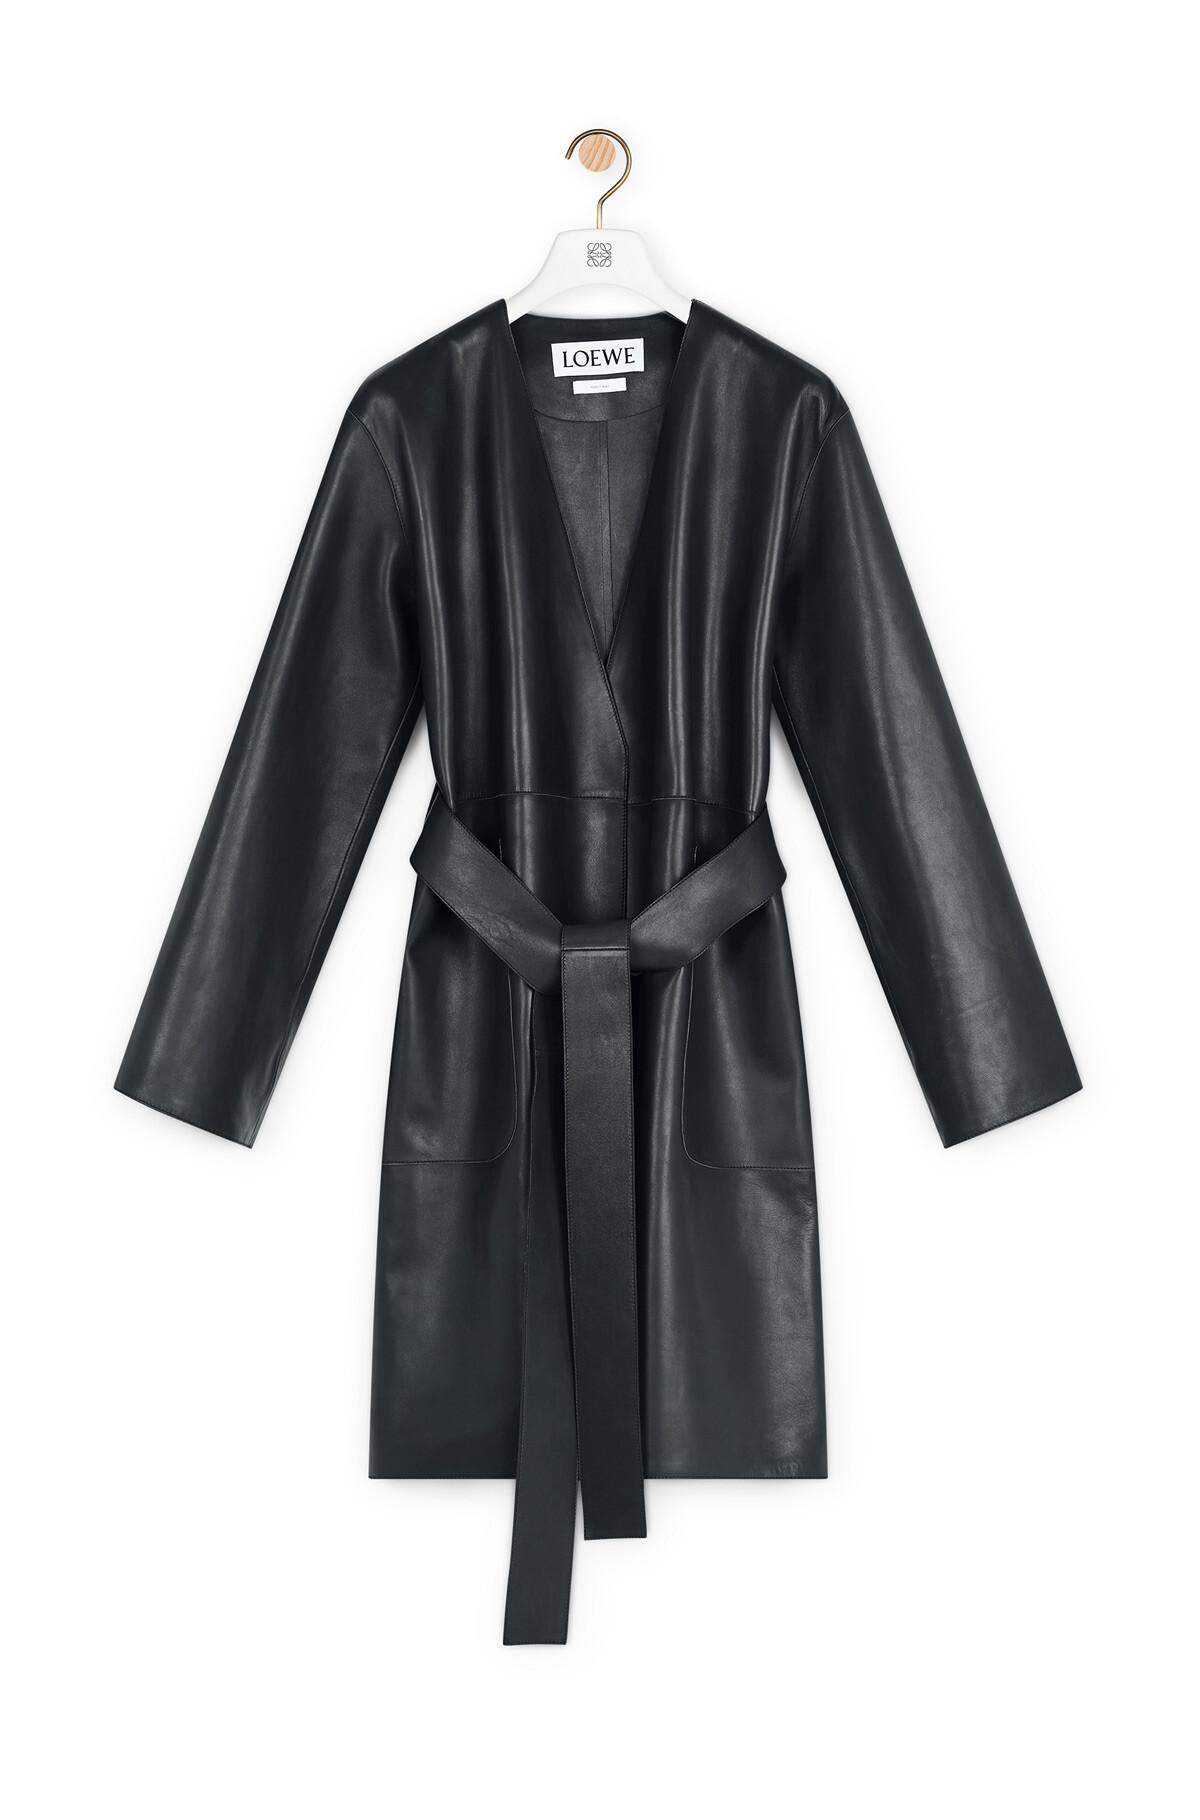 LOEWE Short Coat Black front